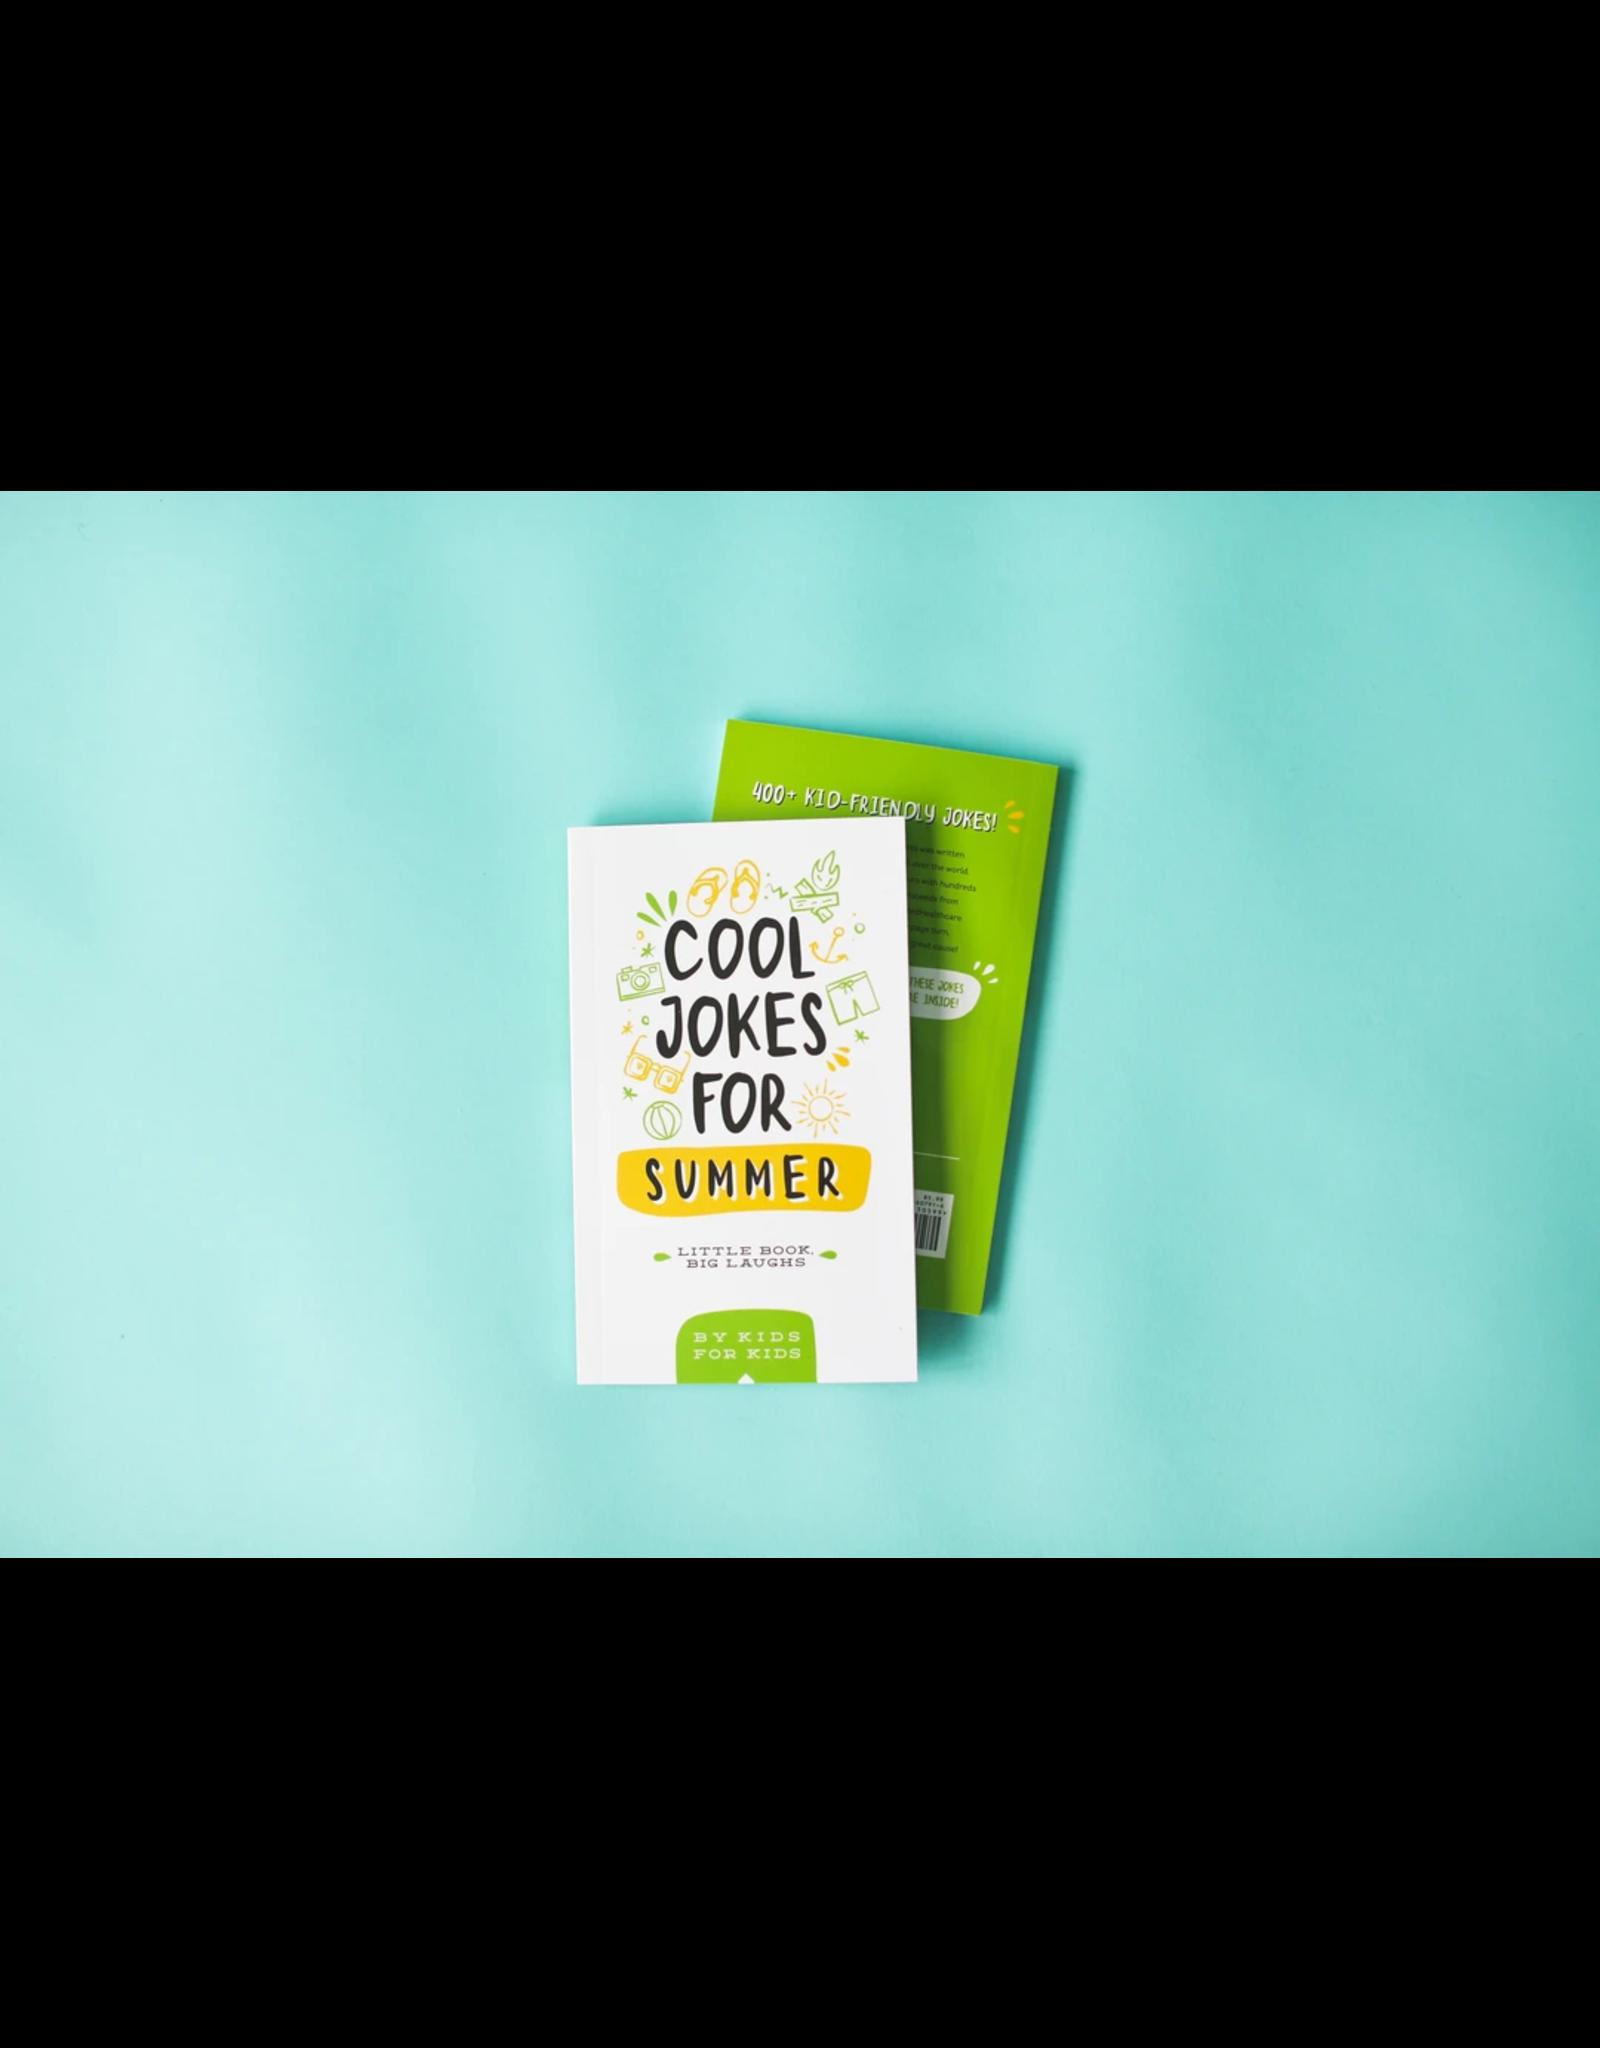 Little Book, Big Laughs - Cool Jokes For Summer